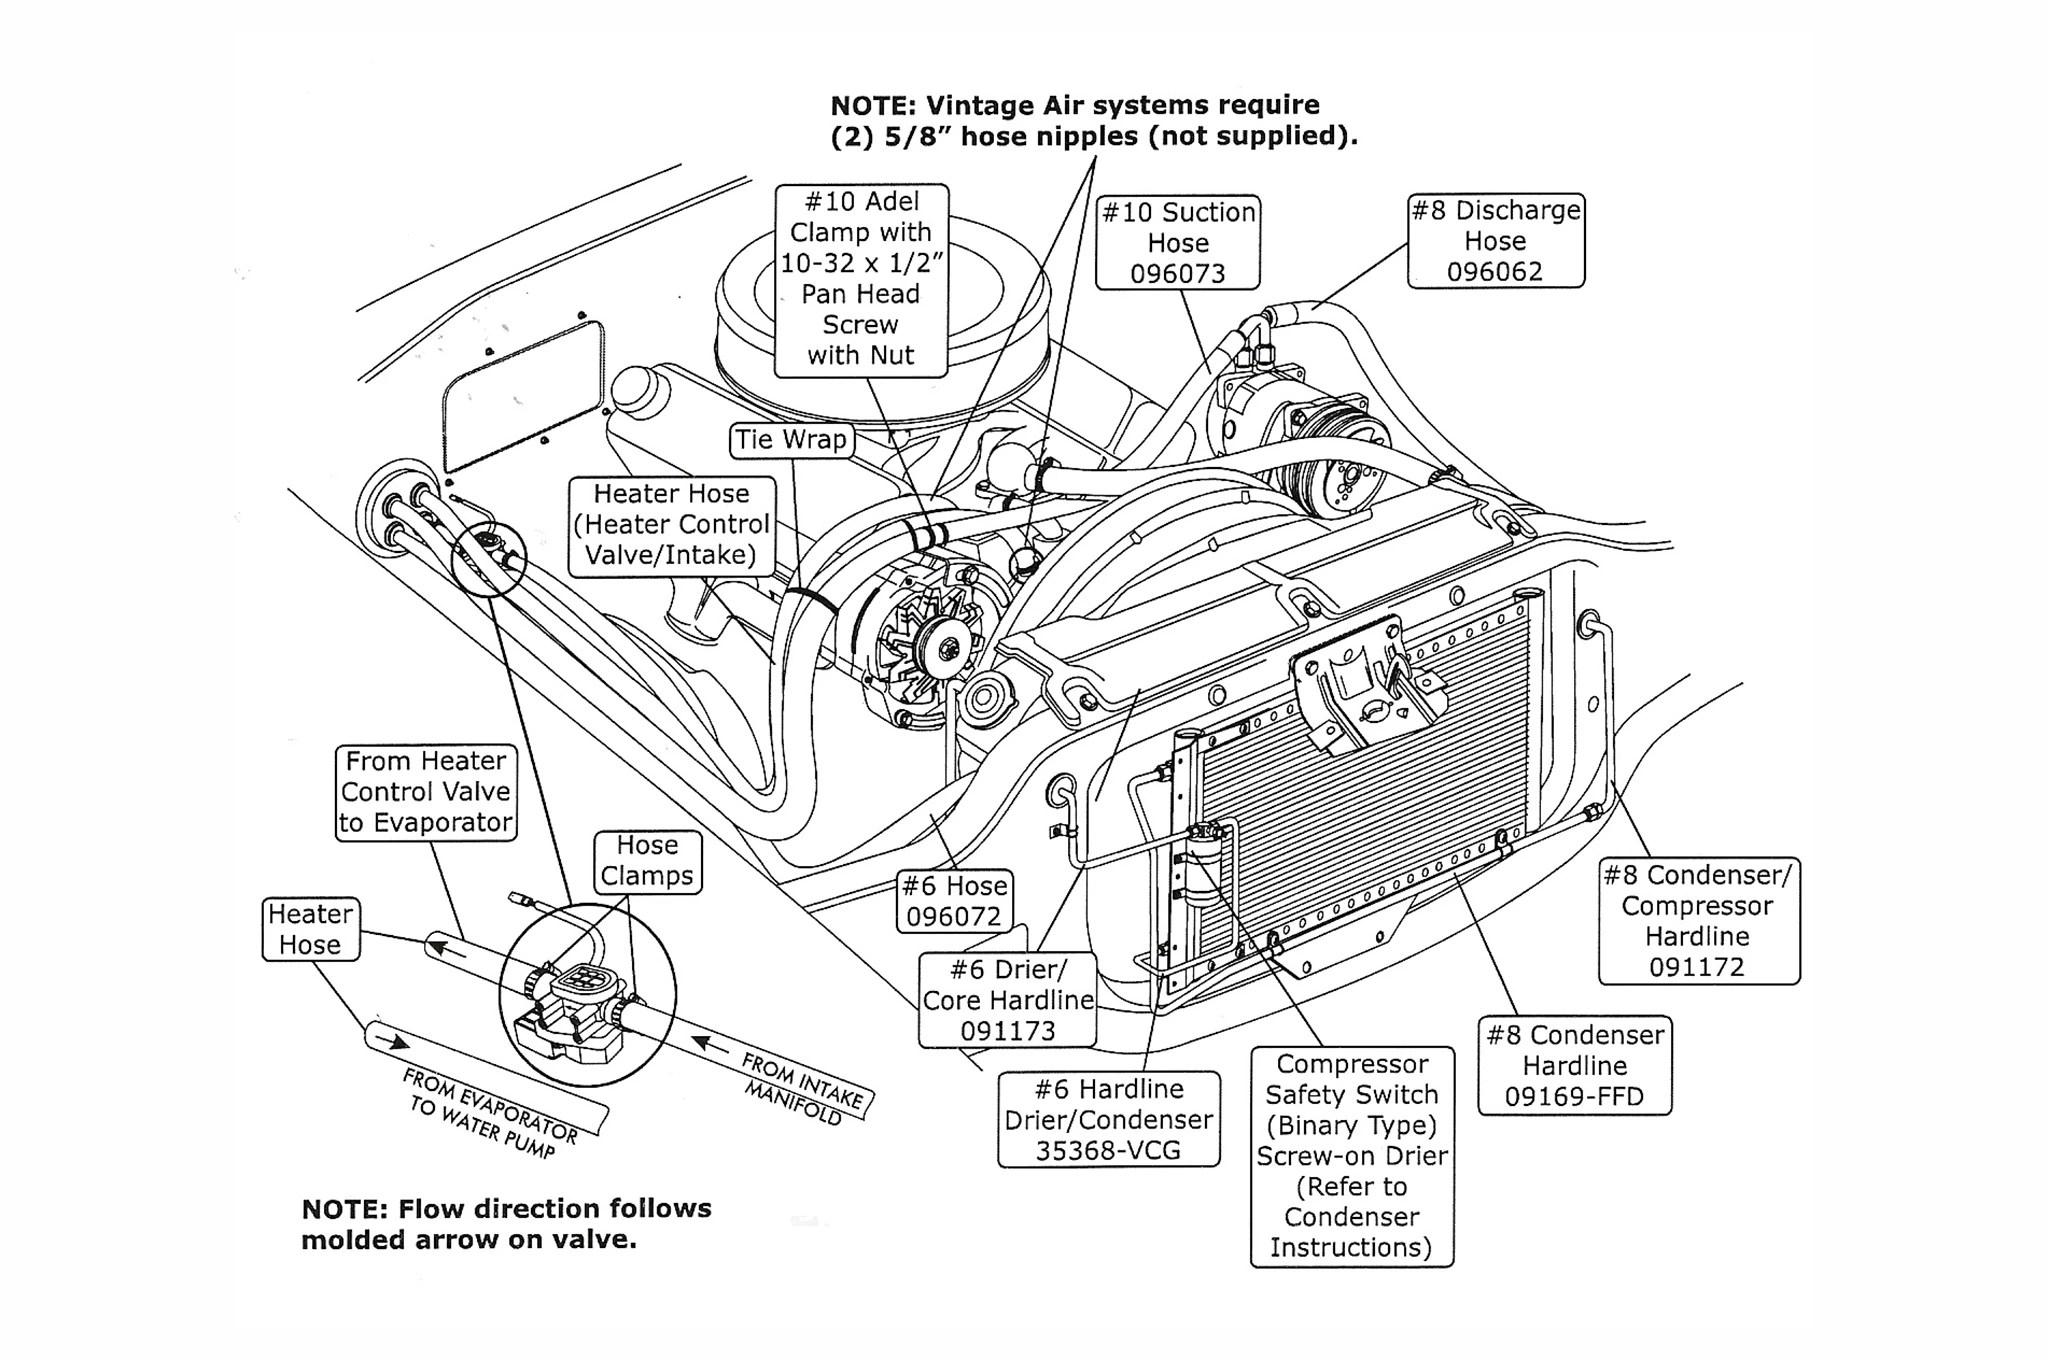 hight resolution of chevelle alternator wiring diagram on 1967 chevelle alternator wiring diagram 66 chevelle